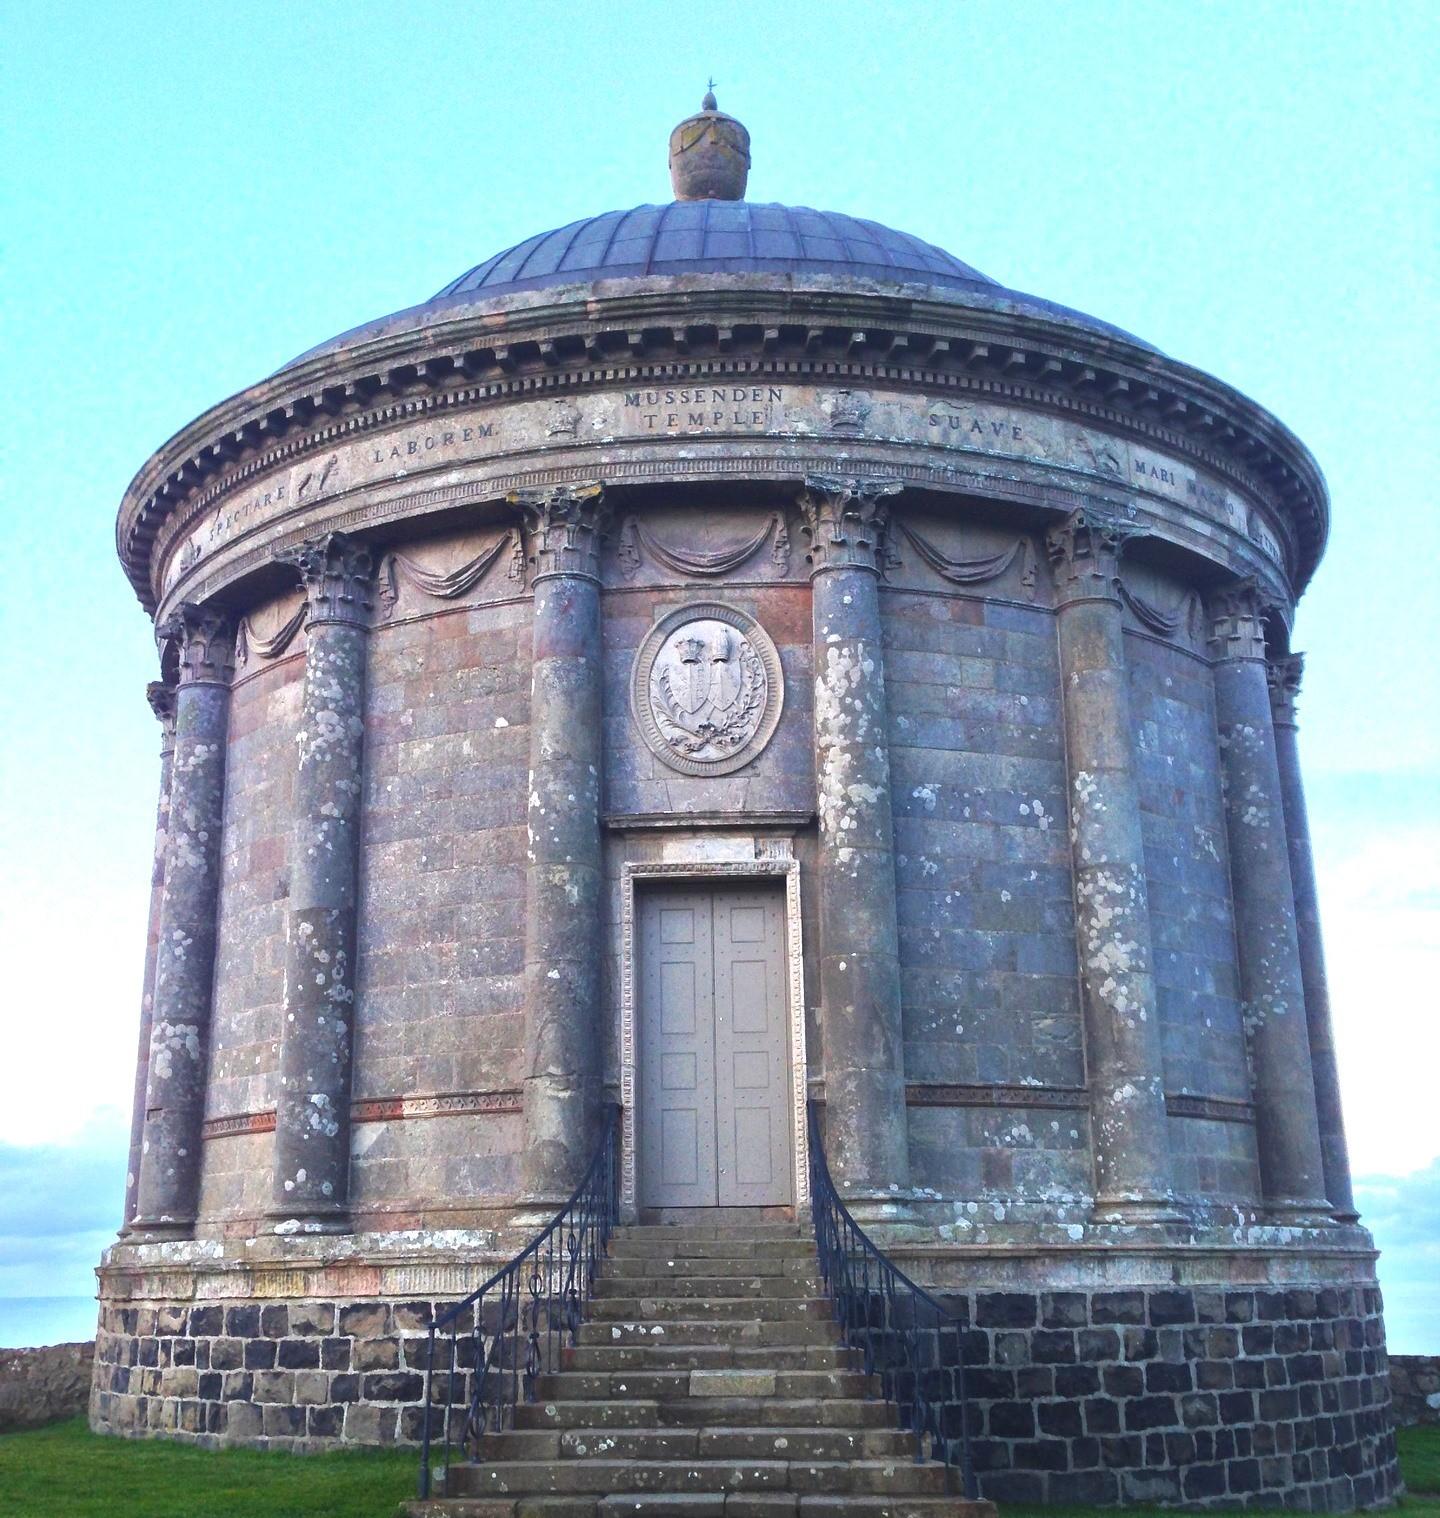 Храм Муссенден (Mussenden Temple) Северная Ирландия